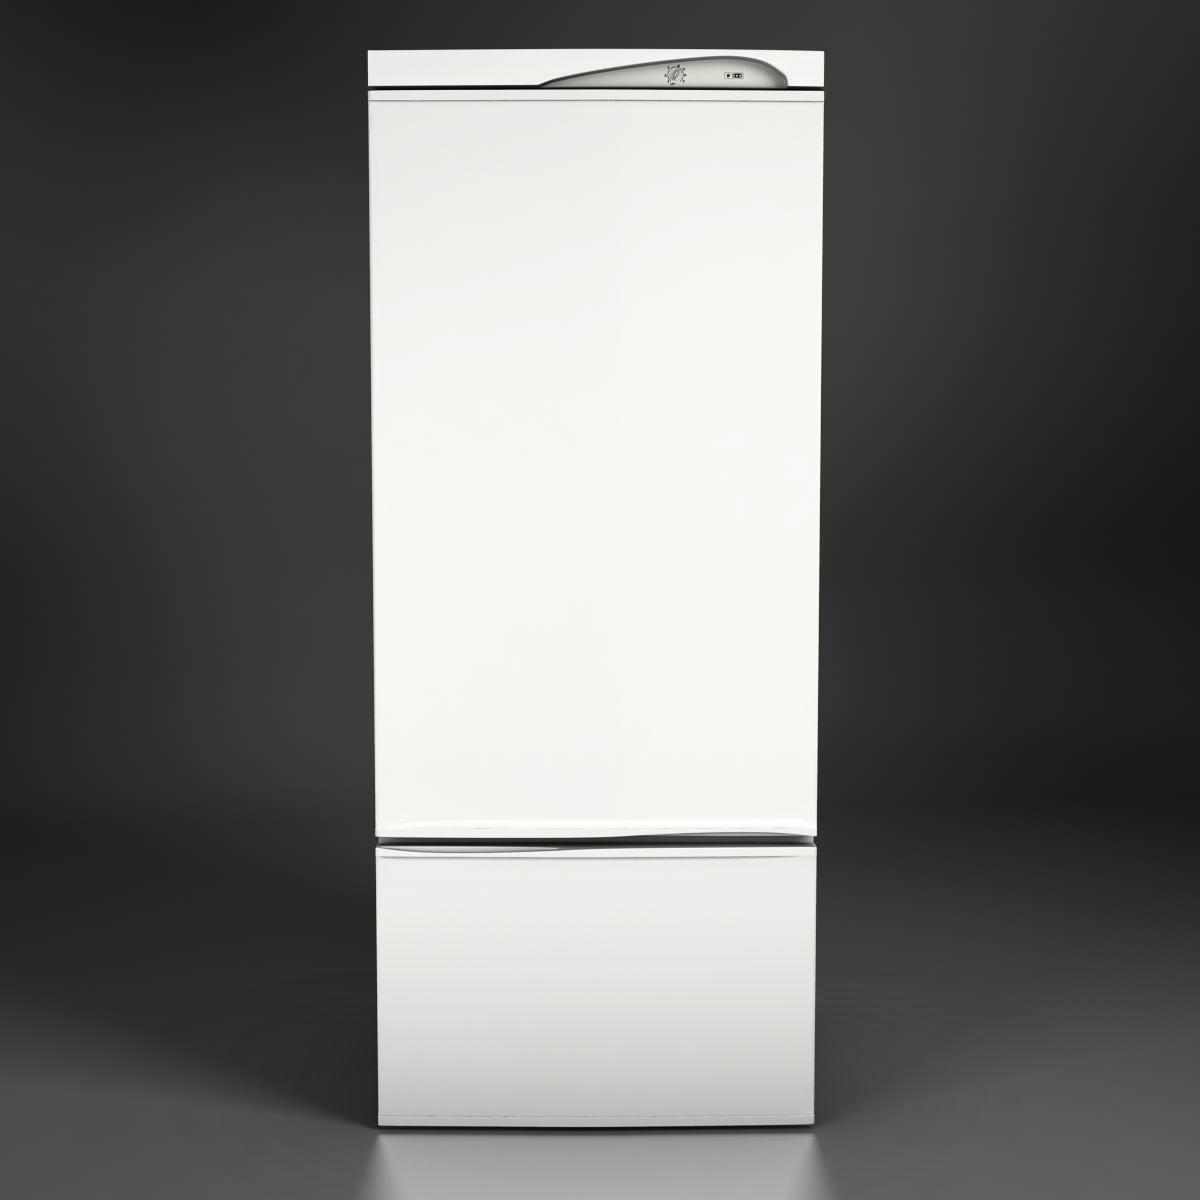 fridge 3d model 3ds max fbx ma mb obj 158906